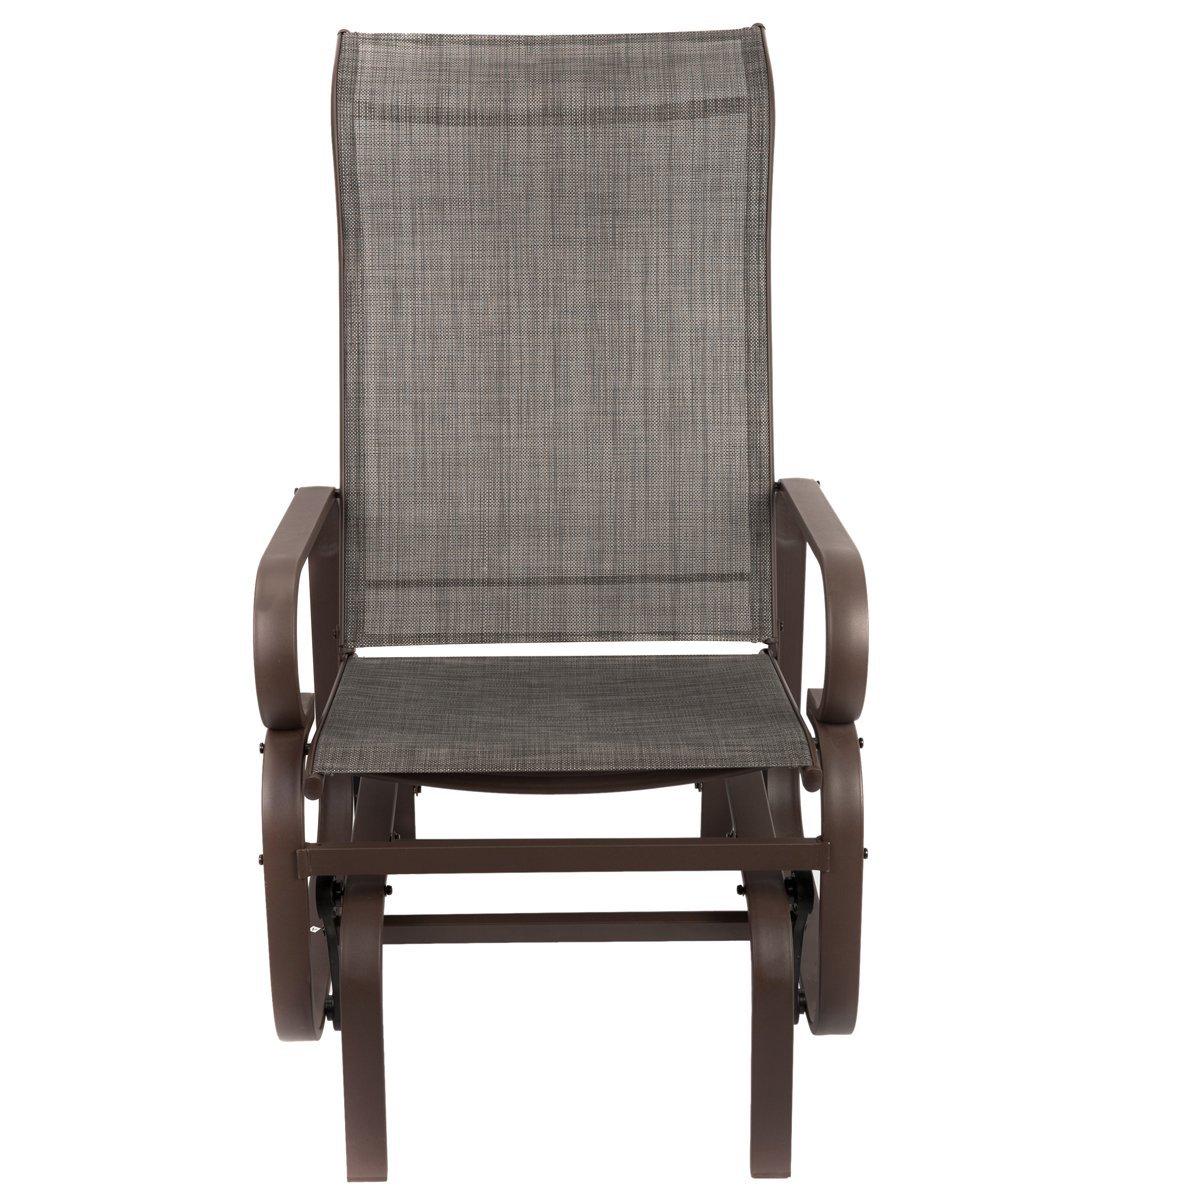 Naturefun Outdoor Patio Rocker Chair Balcony Glider Rocking Lounge Chair Be